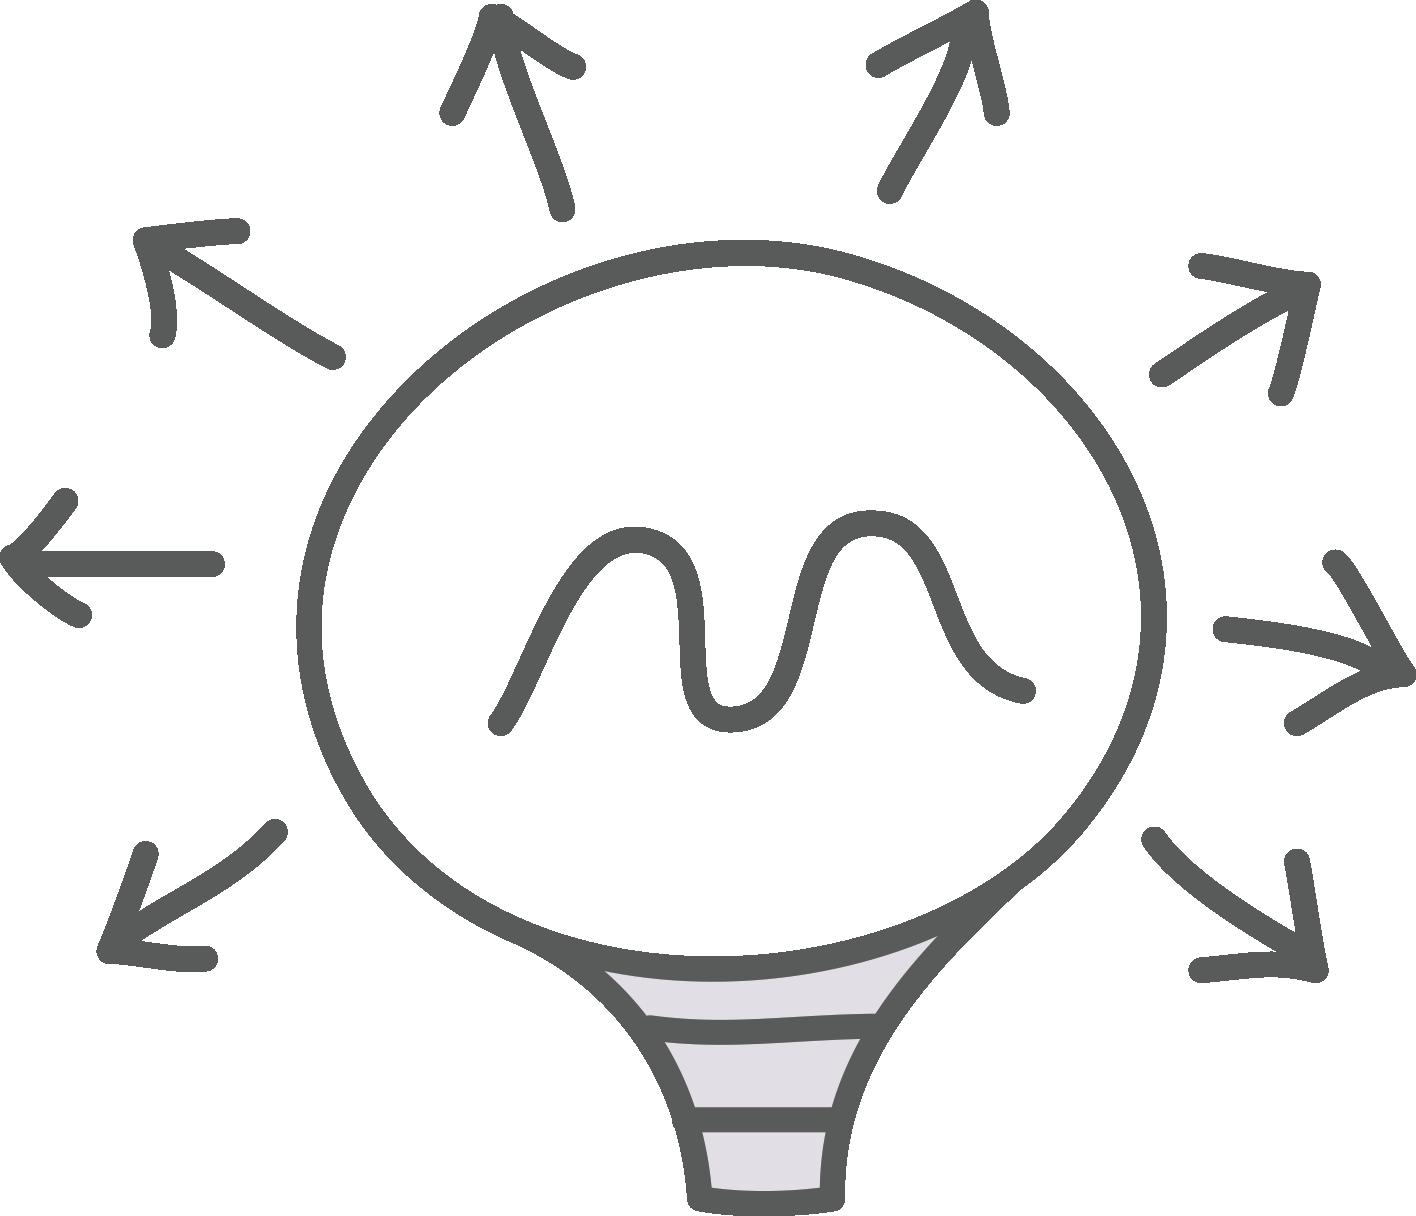 A light bulb moment